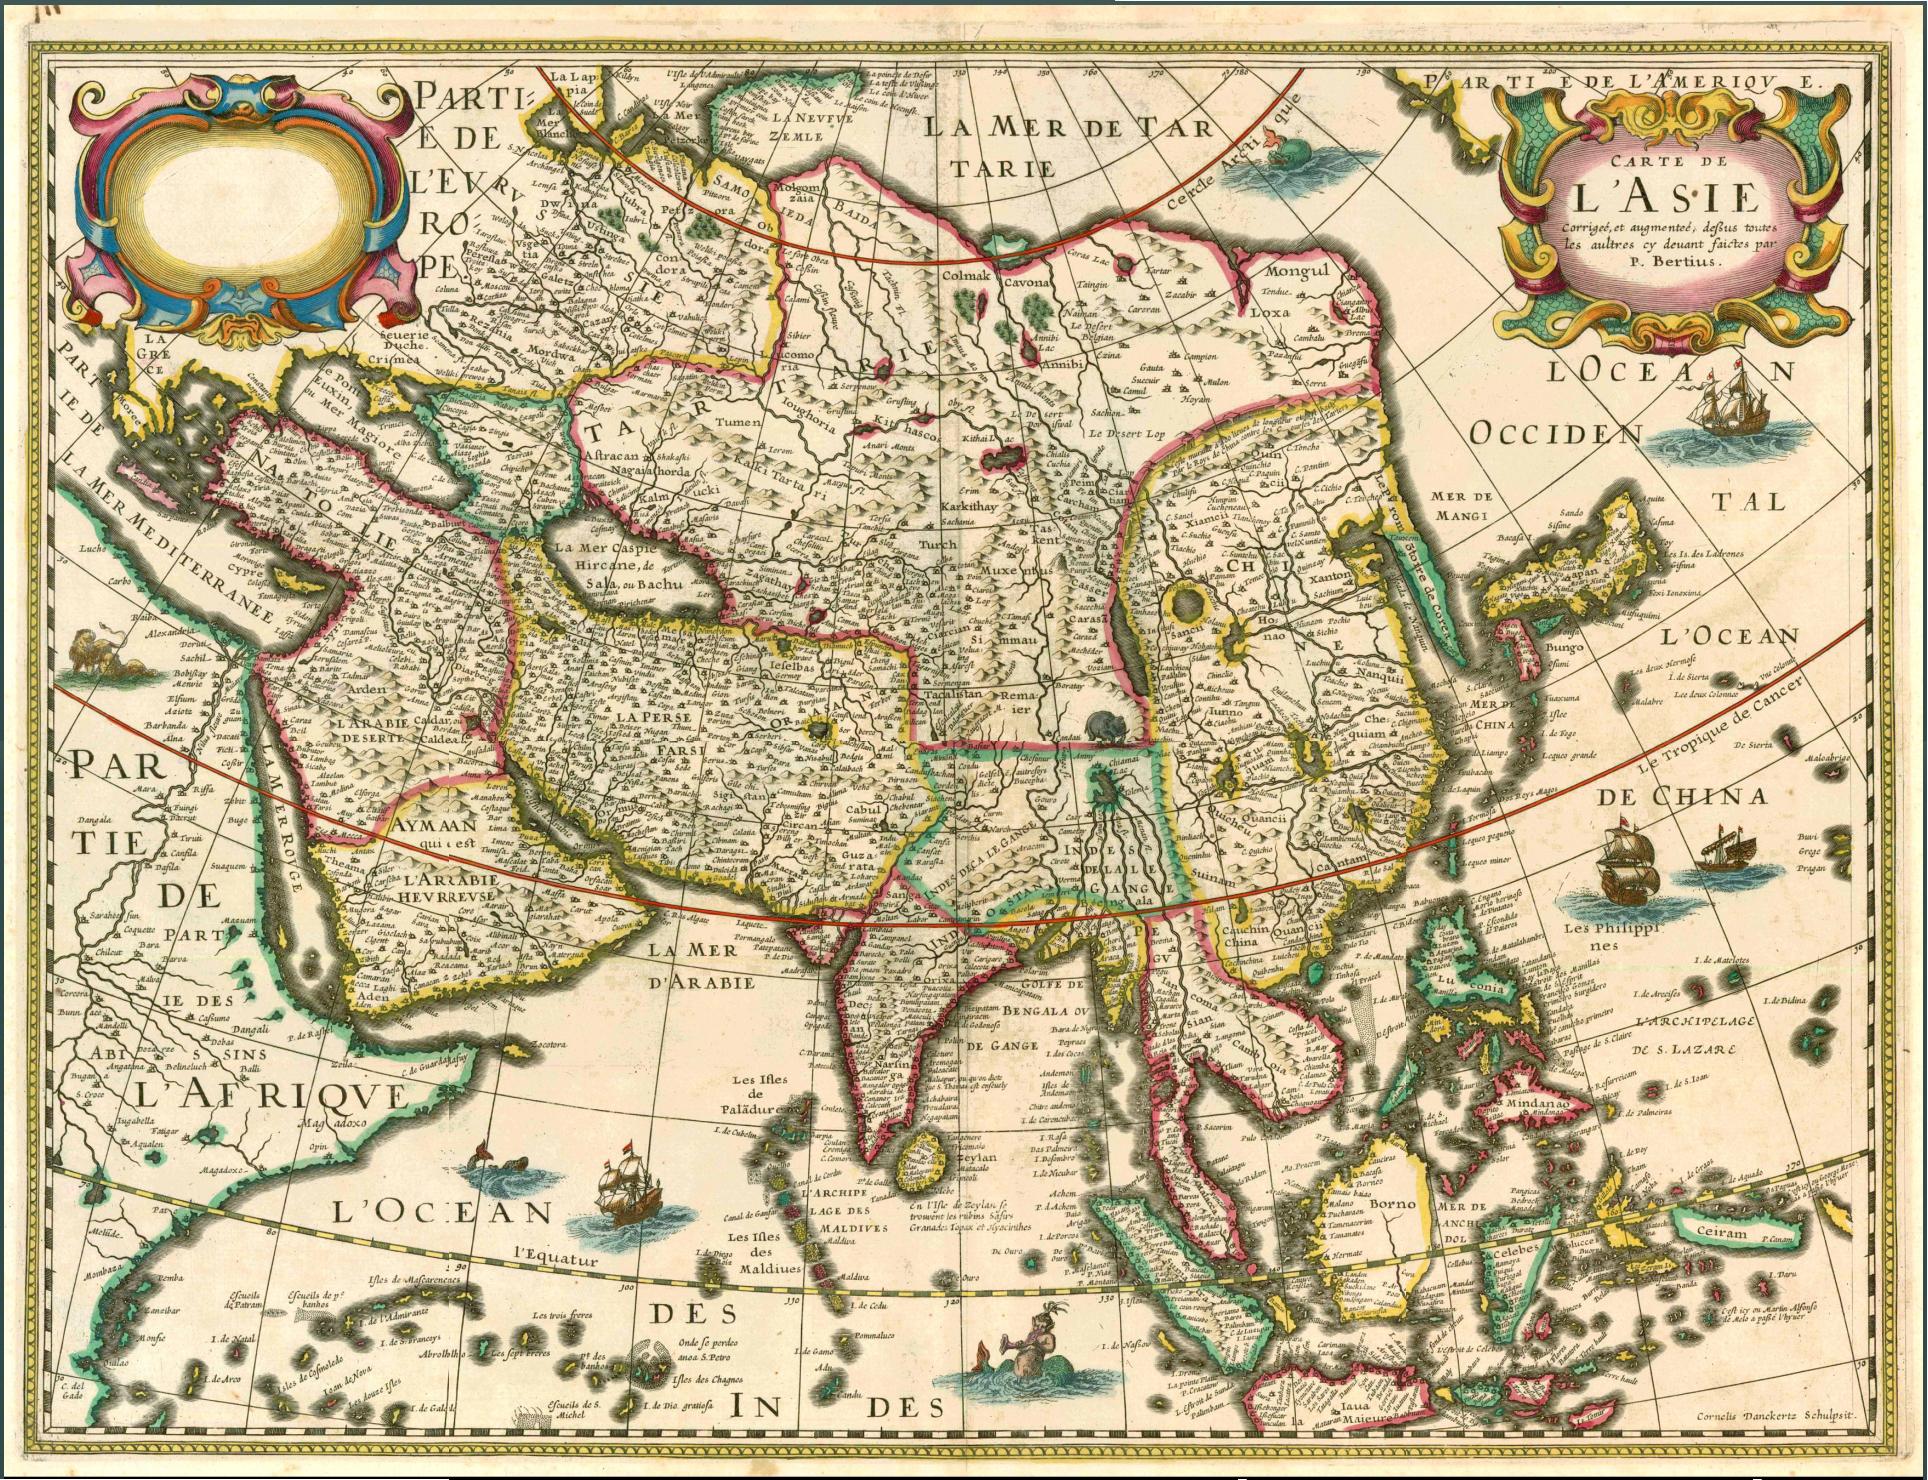 Carte De Lasie.File 1627 Carte De L Asie Bertius Jpg Wikipedia